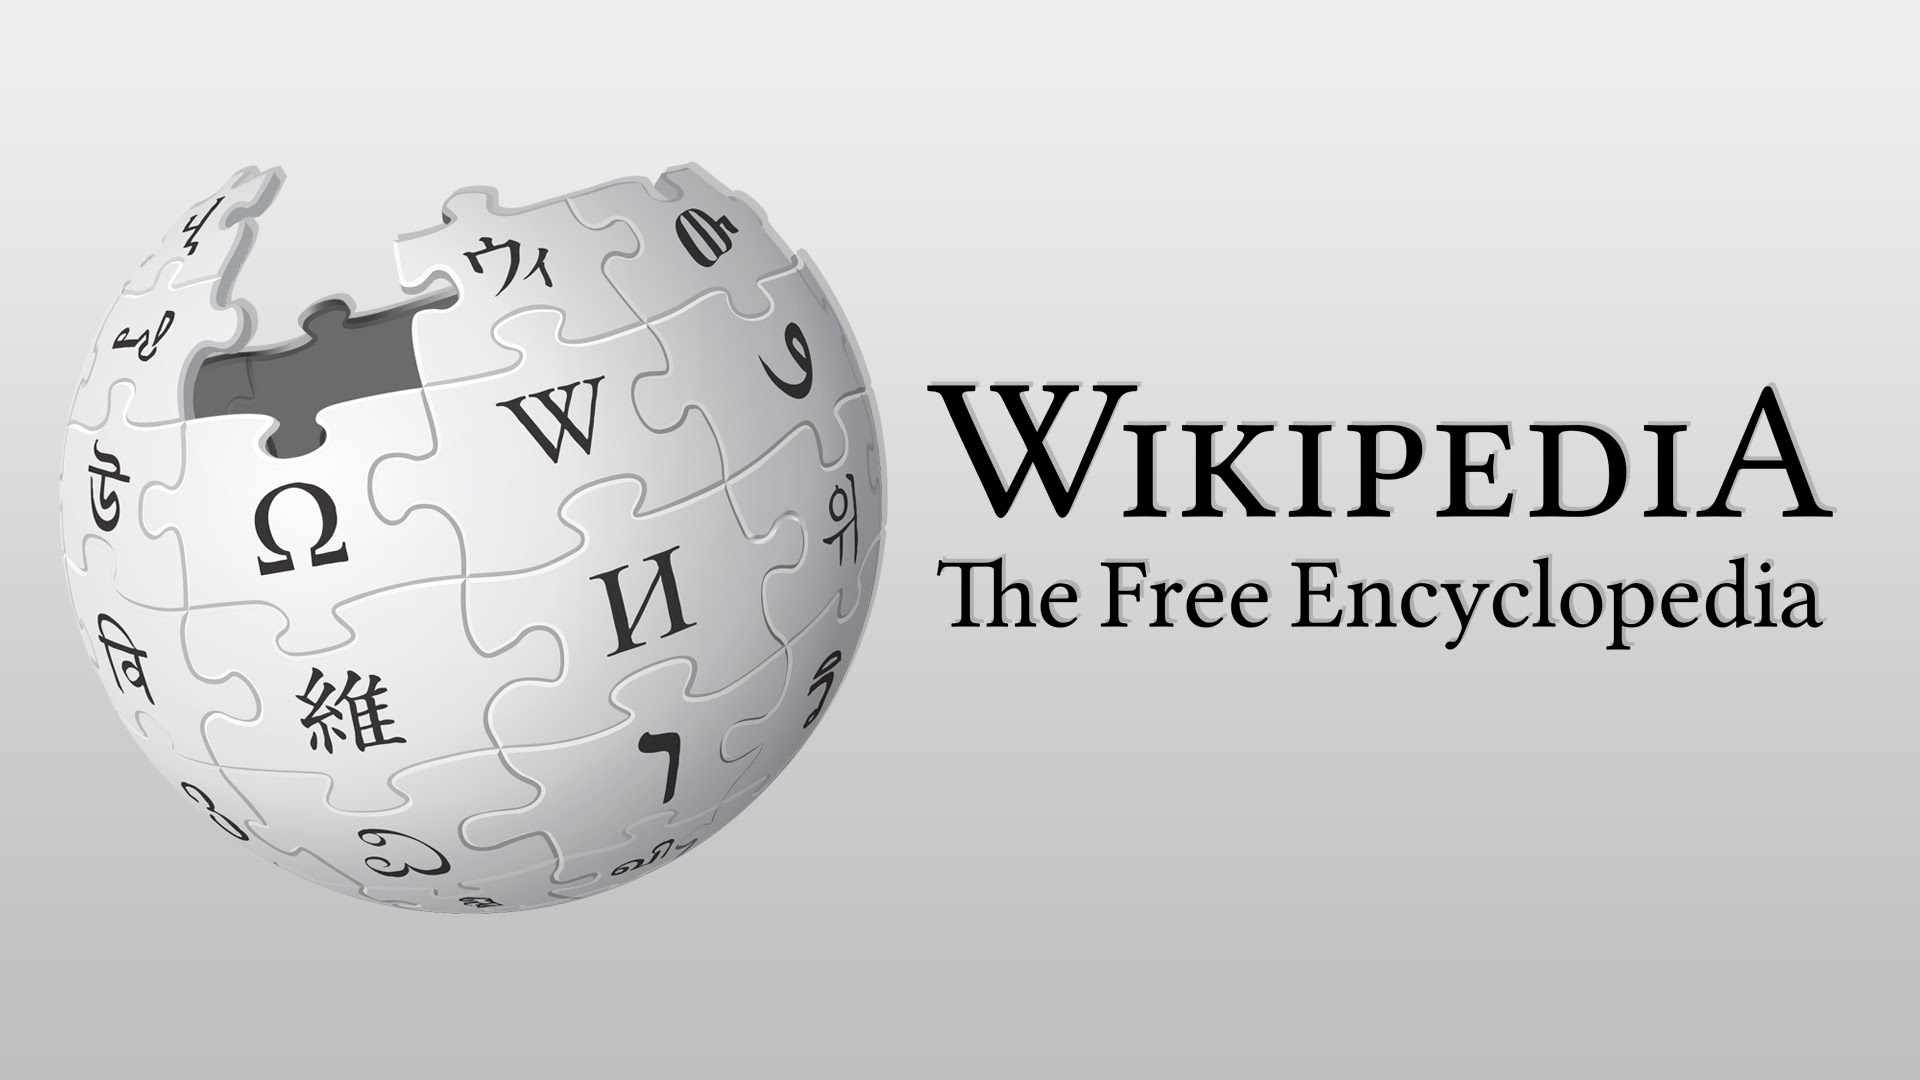 A wikipdia inventou o rei portugus d jimenex h mais mentiras stopboris Images